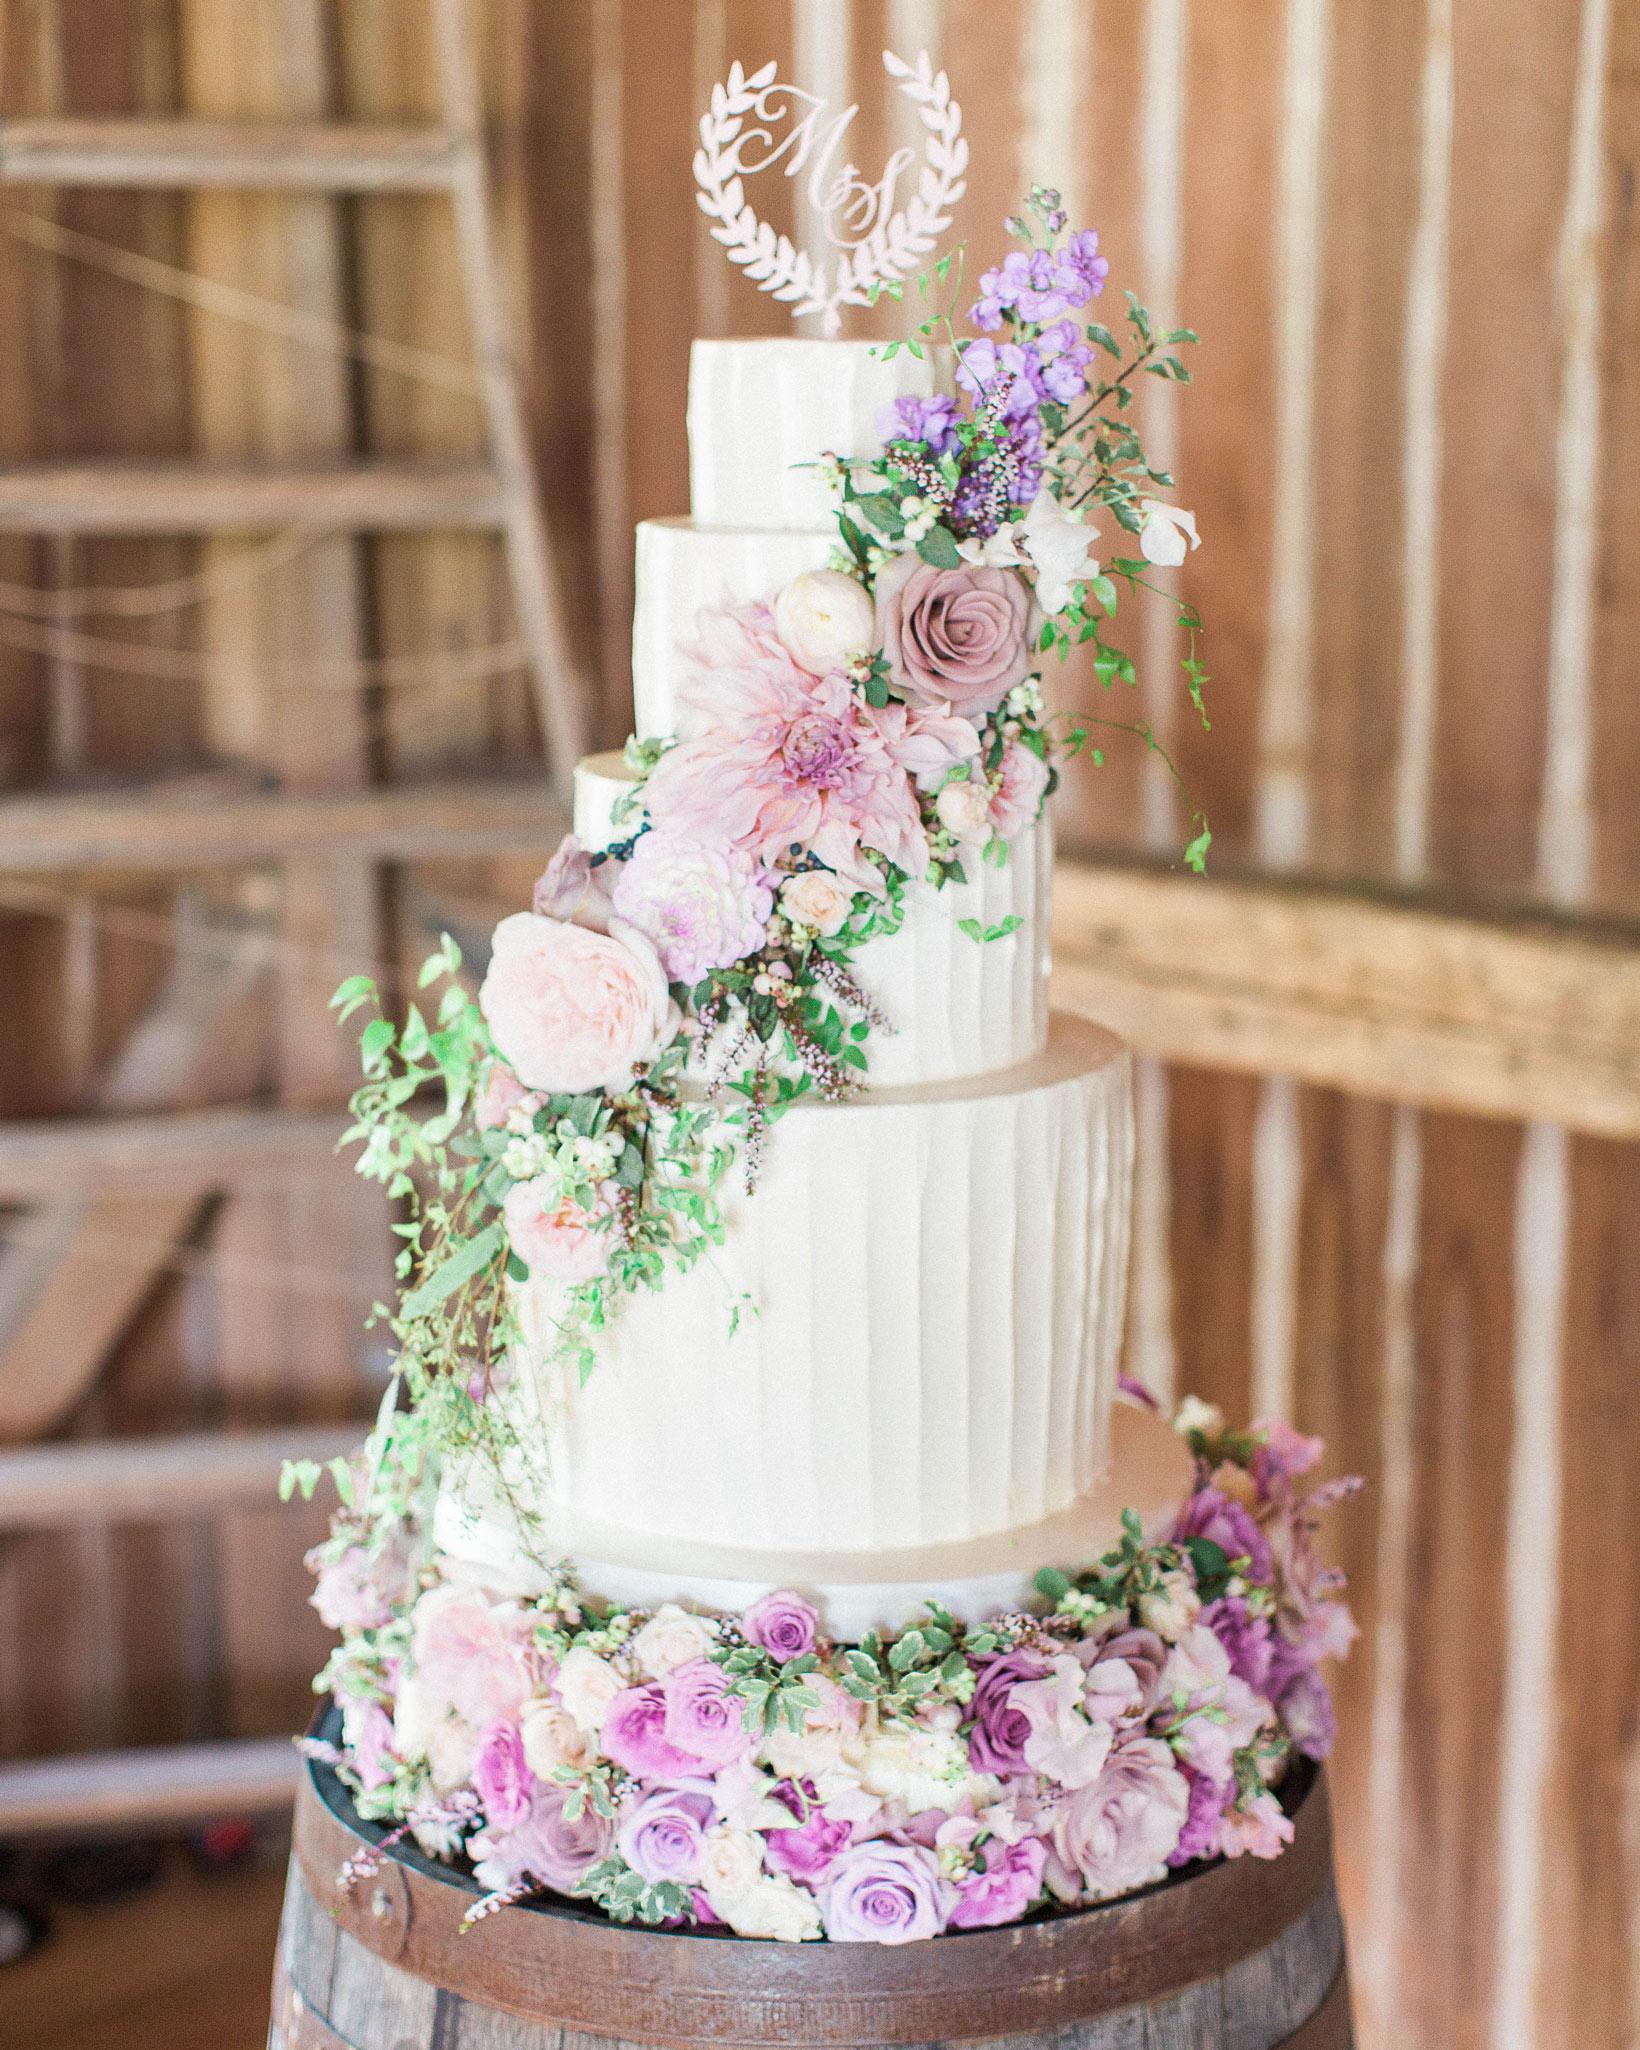 sarah-michael-wedding-cake-827-s112783-0416.jpg